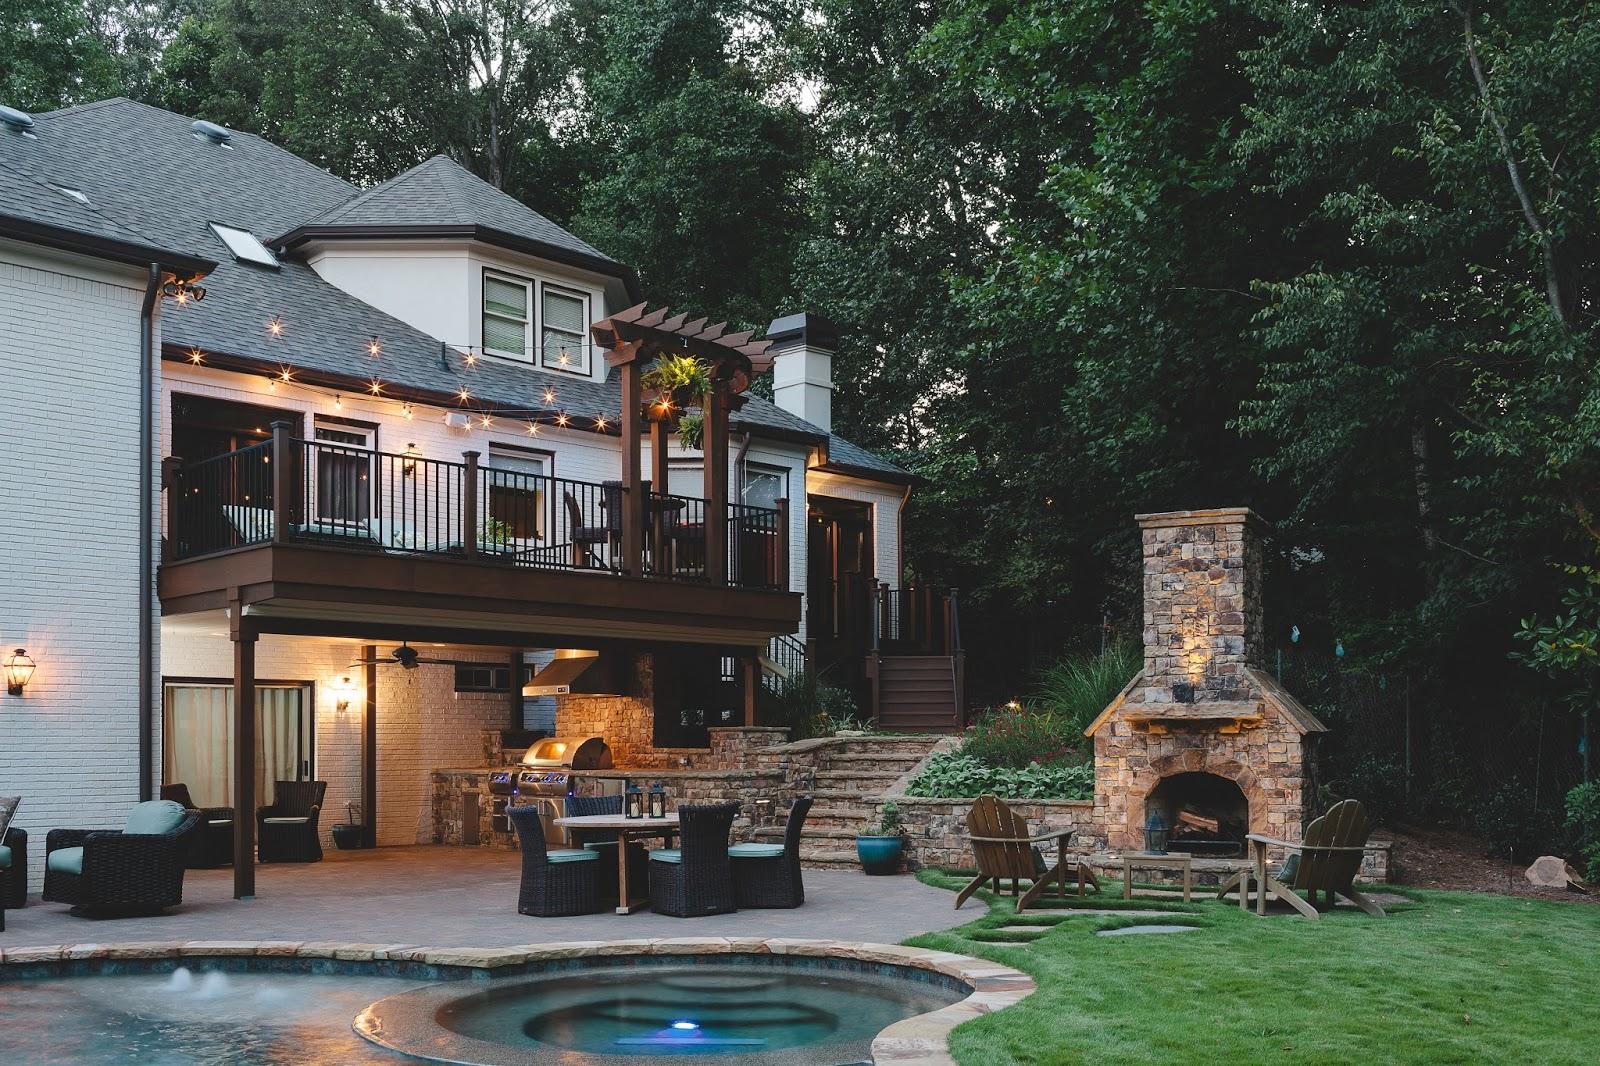 pool and deck in backyard